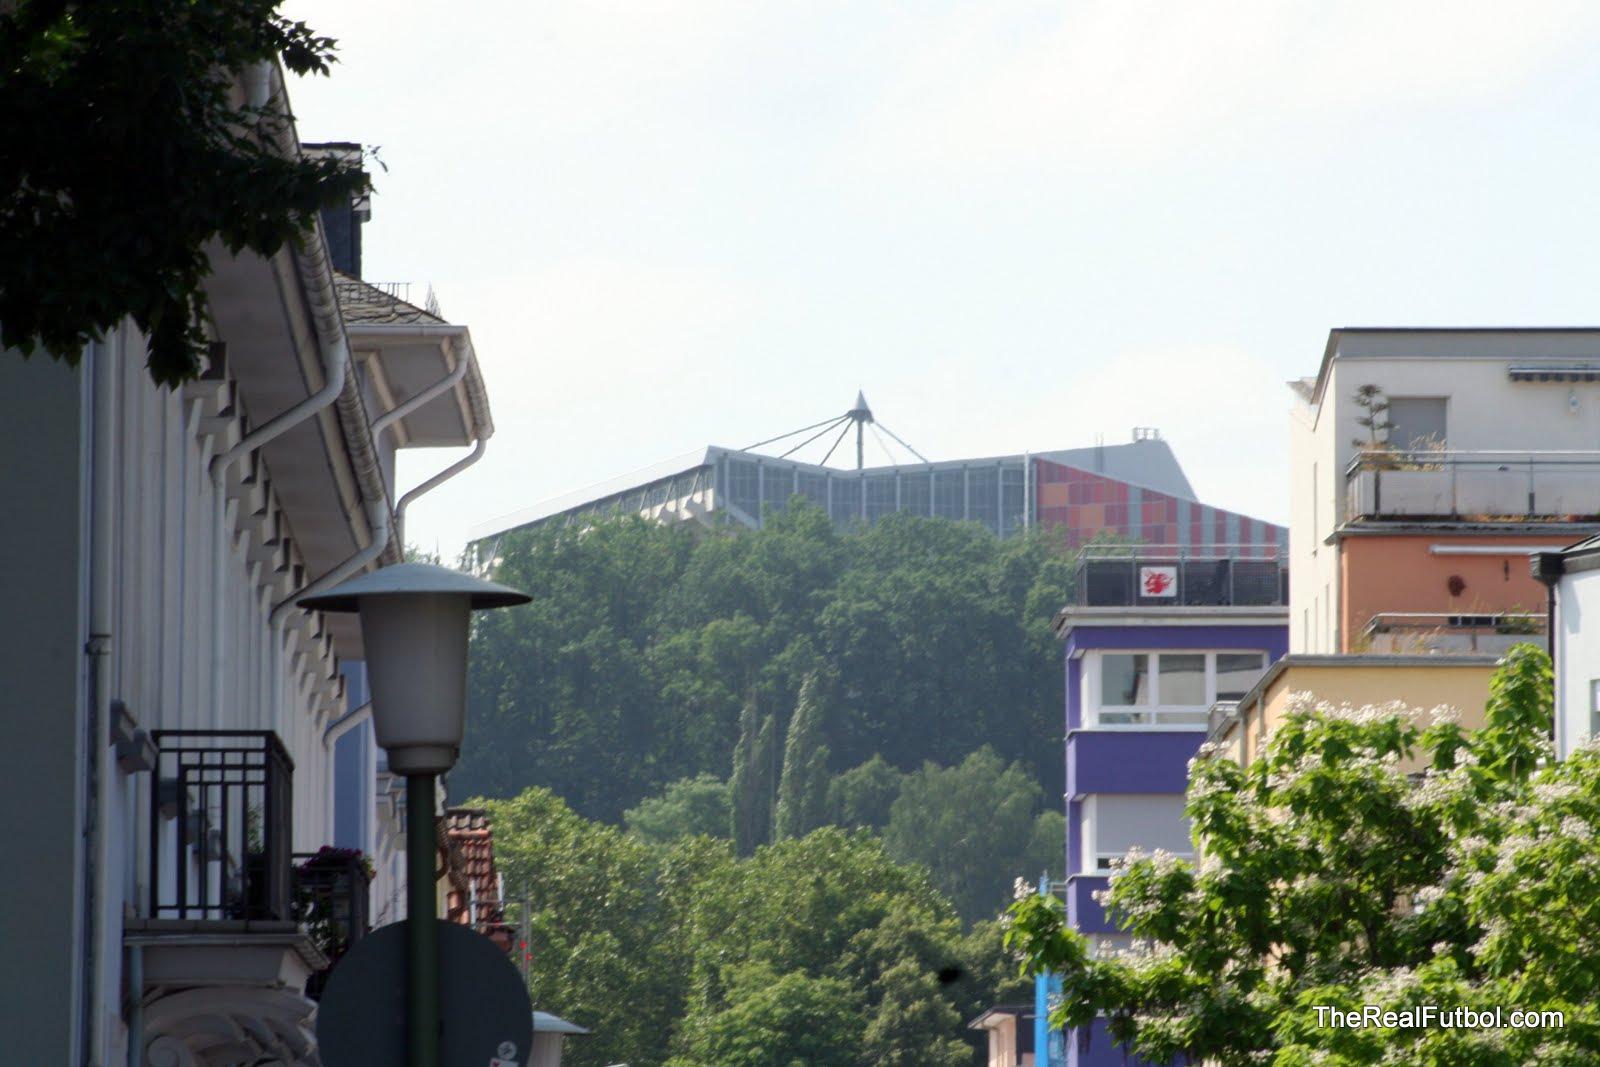 madleyinlove, Female, Kaiserslautern, Rheinland-Pfalz, Germany